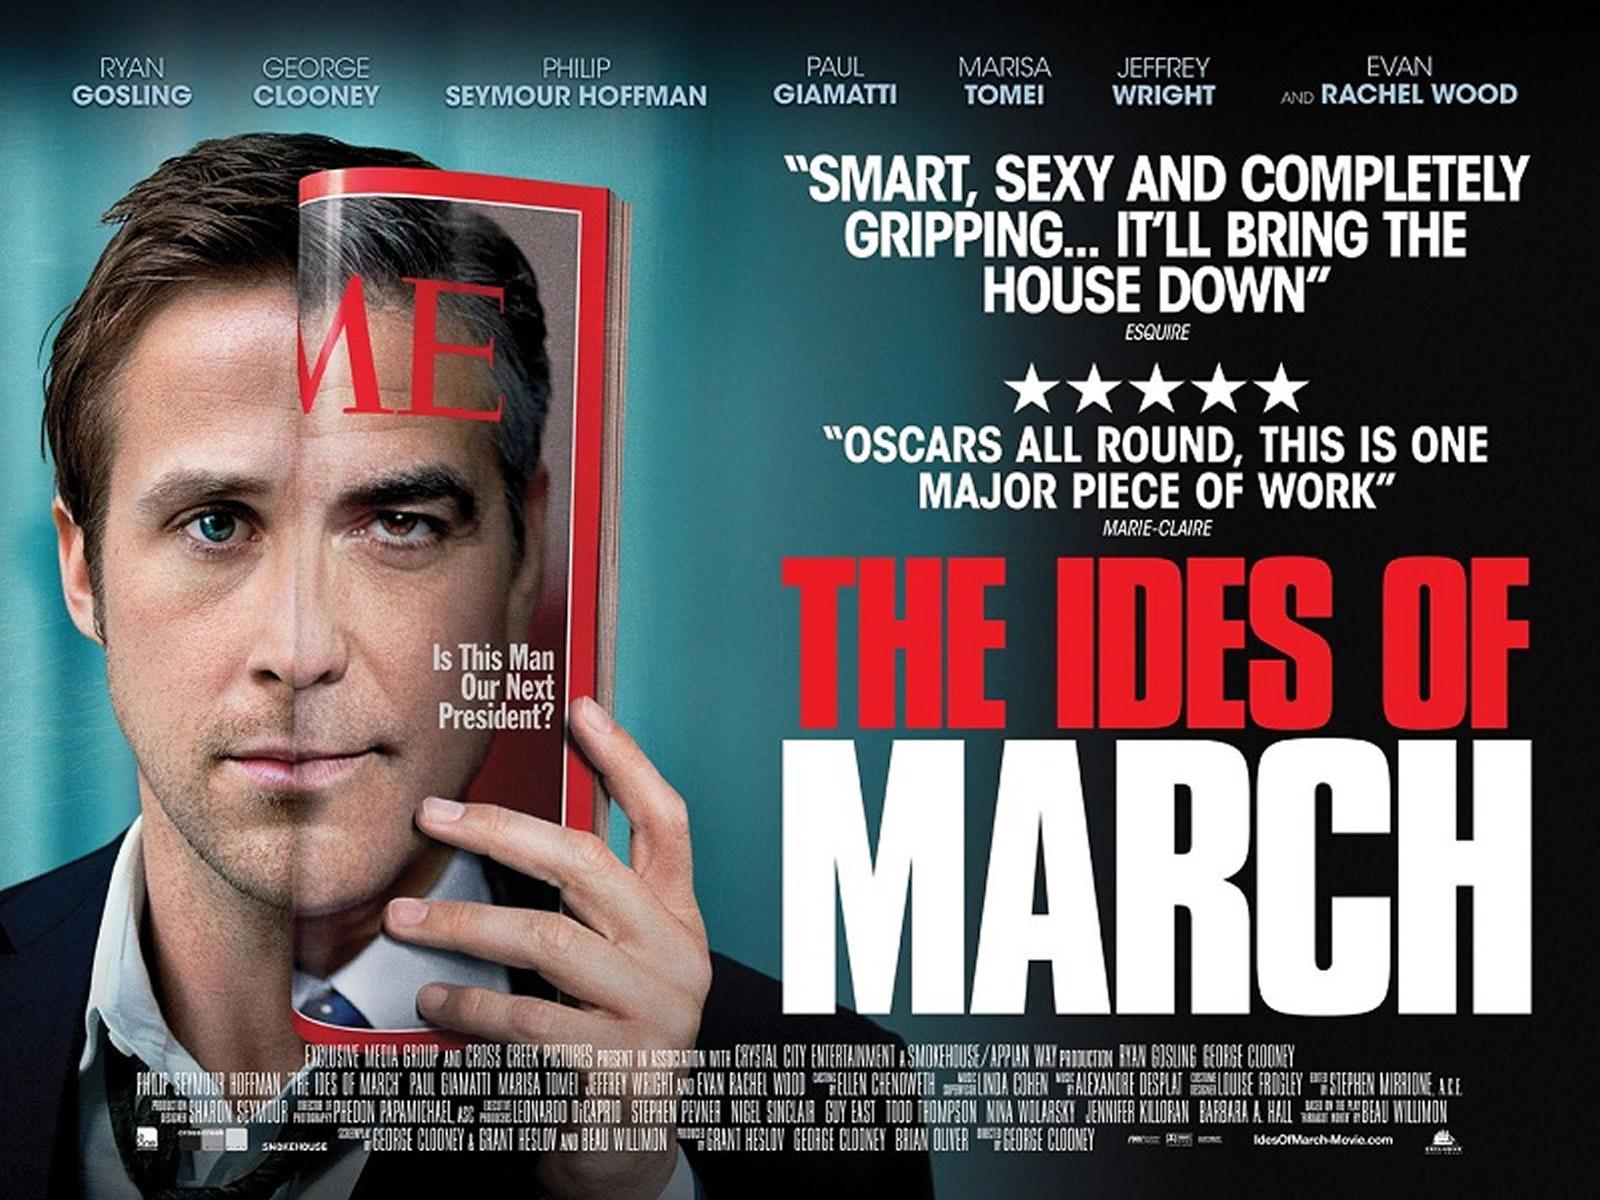 http://3.bp.blogspot.com/-Ct_R5mA4soE/T_ARTaH_7FI/AAAAAAAAEZ8/cTWZaupLkY8/s1600/The+Ides+of+March.jpg